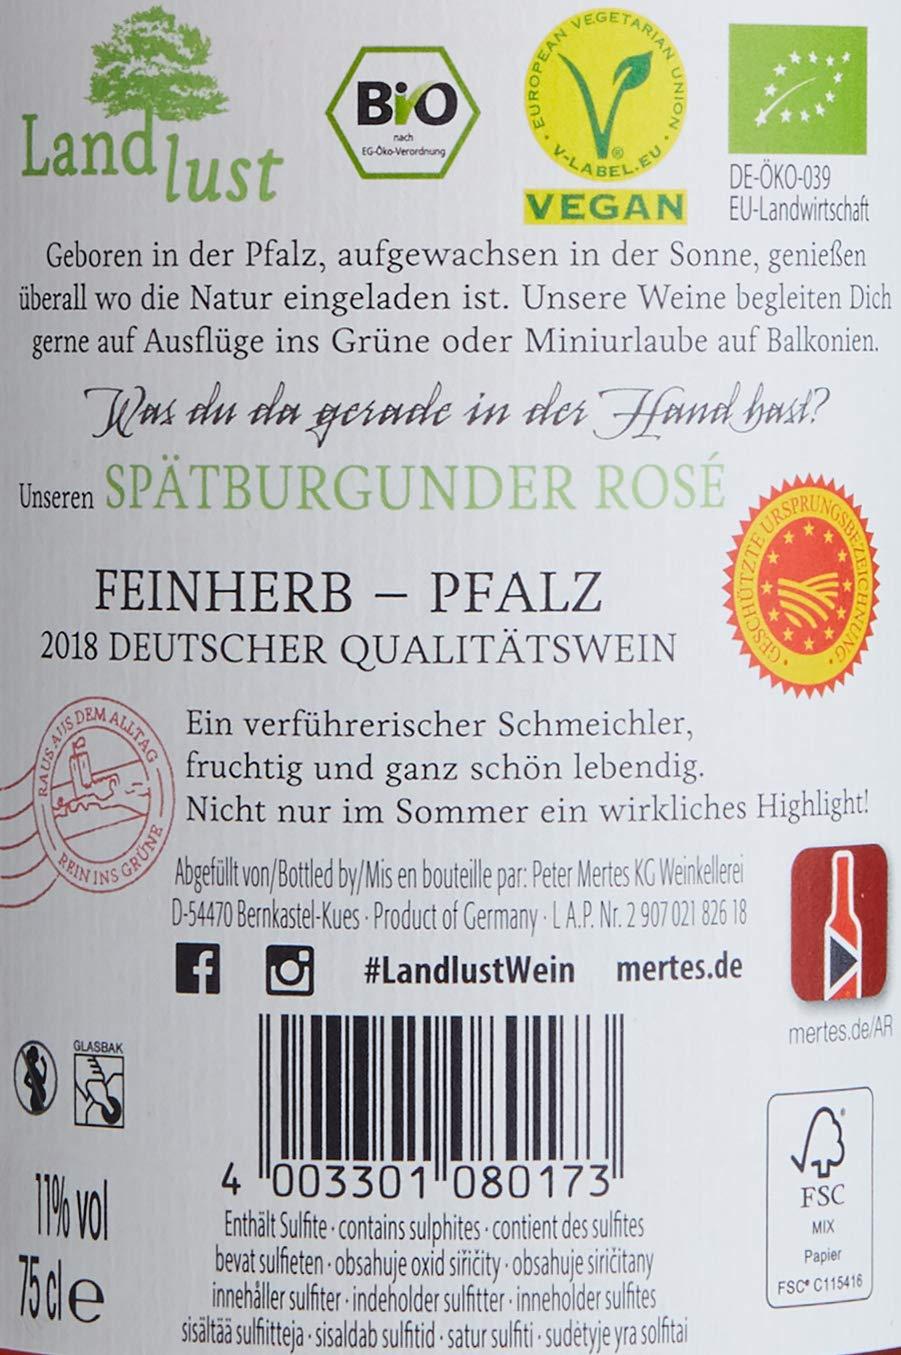 Landlust-Sptburgunder-Ros-feinherb-6-x-075-l